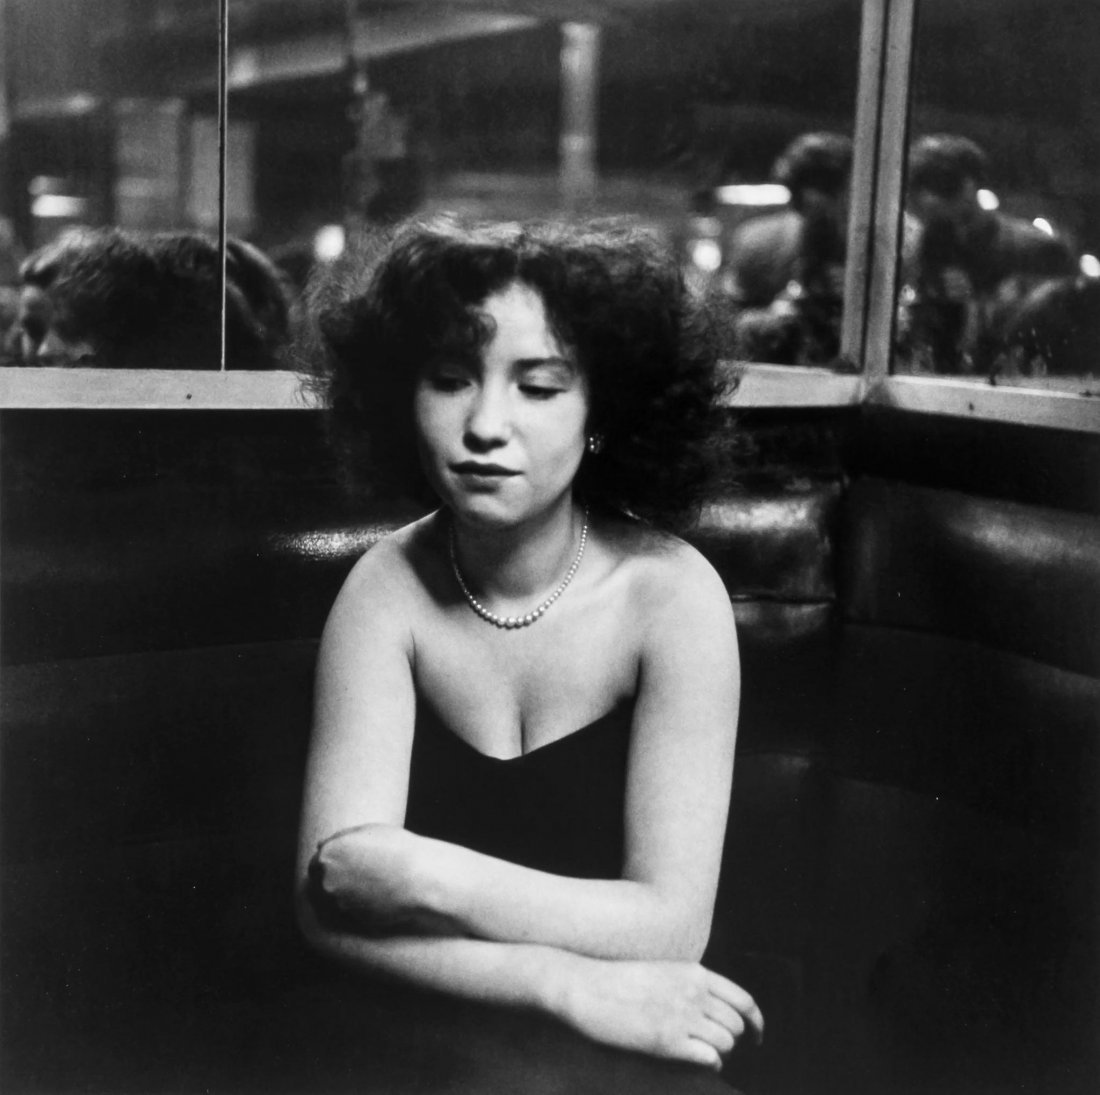 Robert Doisneau (1912-1994) - Mademoiselle Anita, 1951